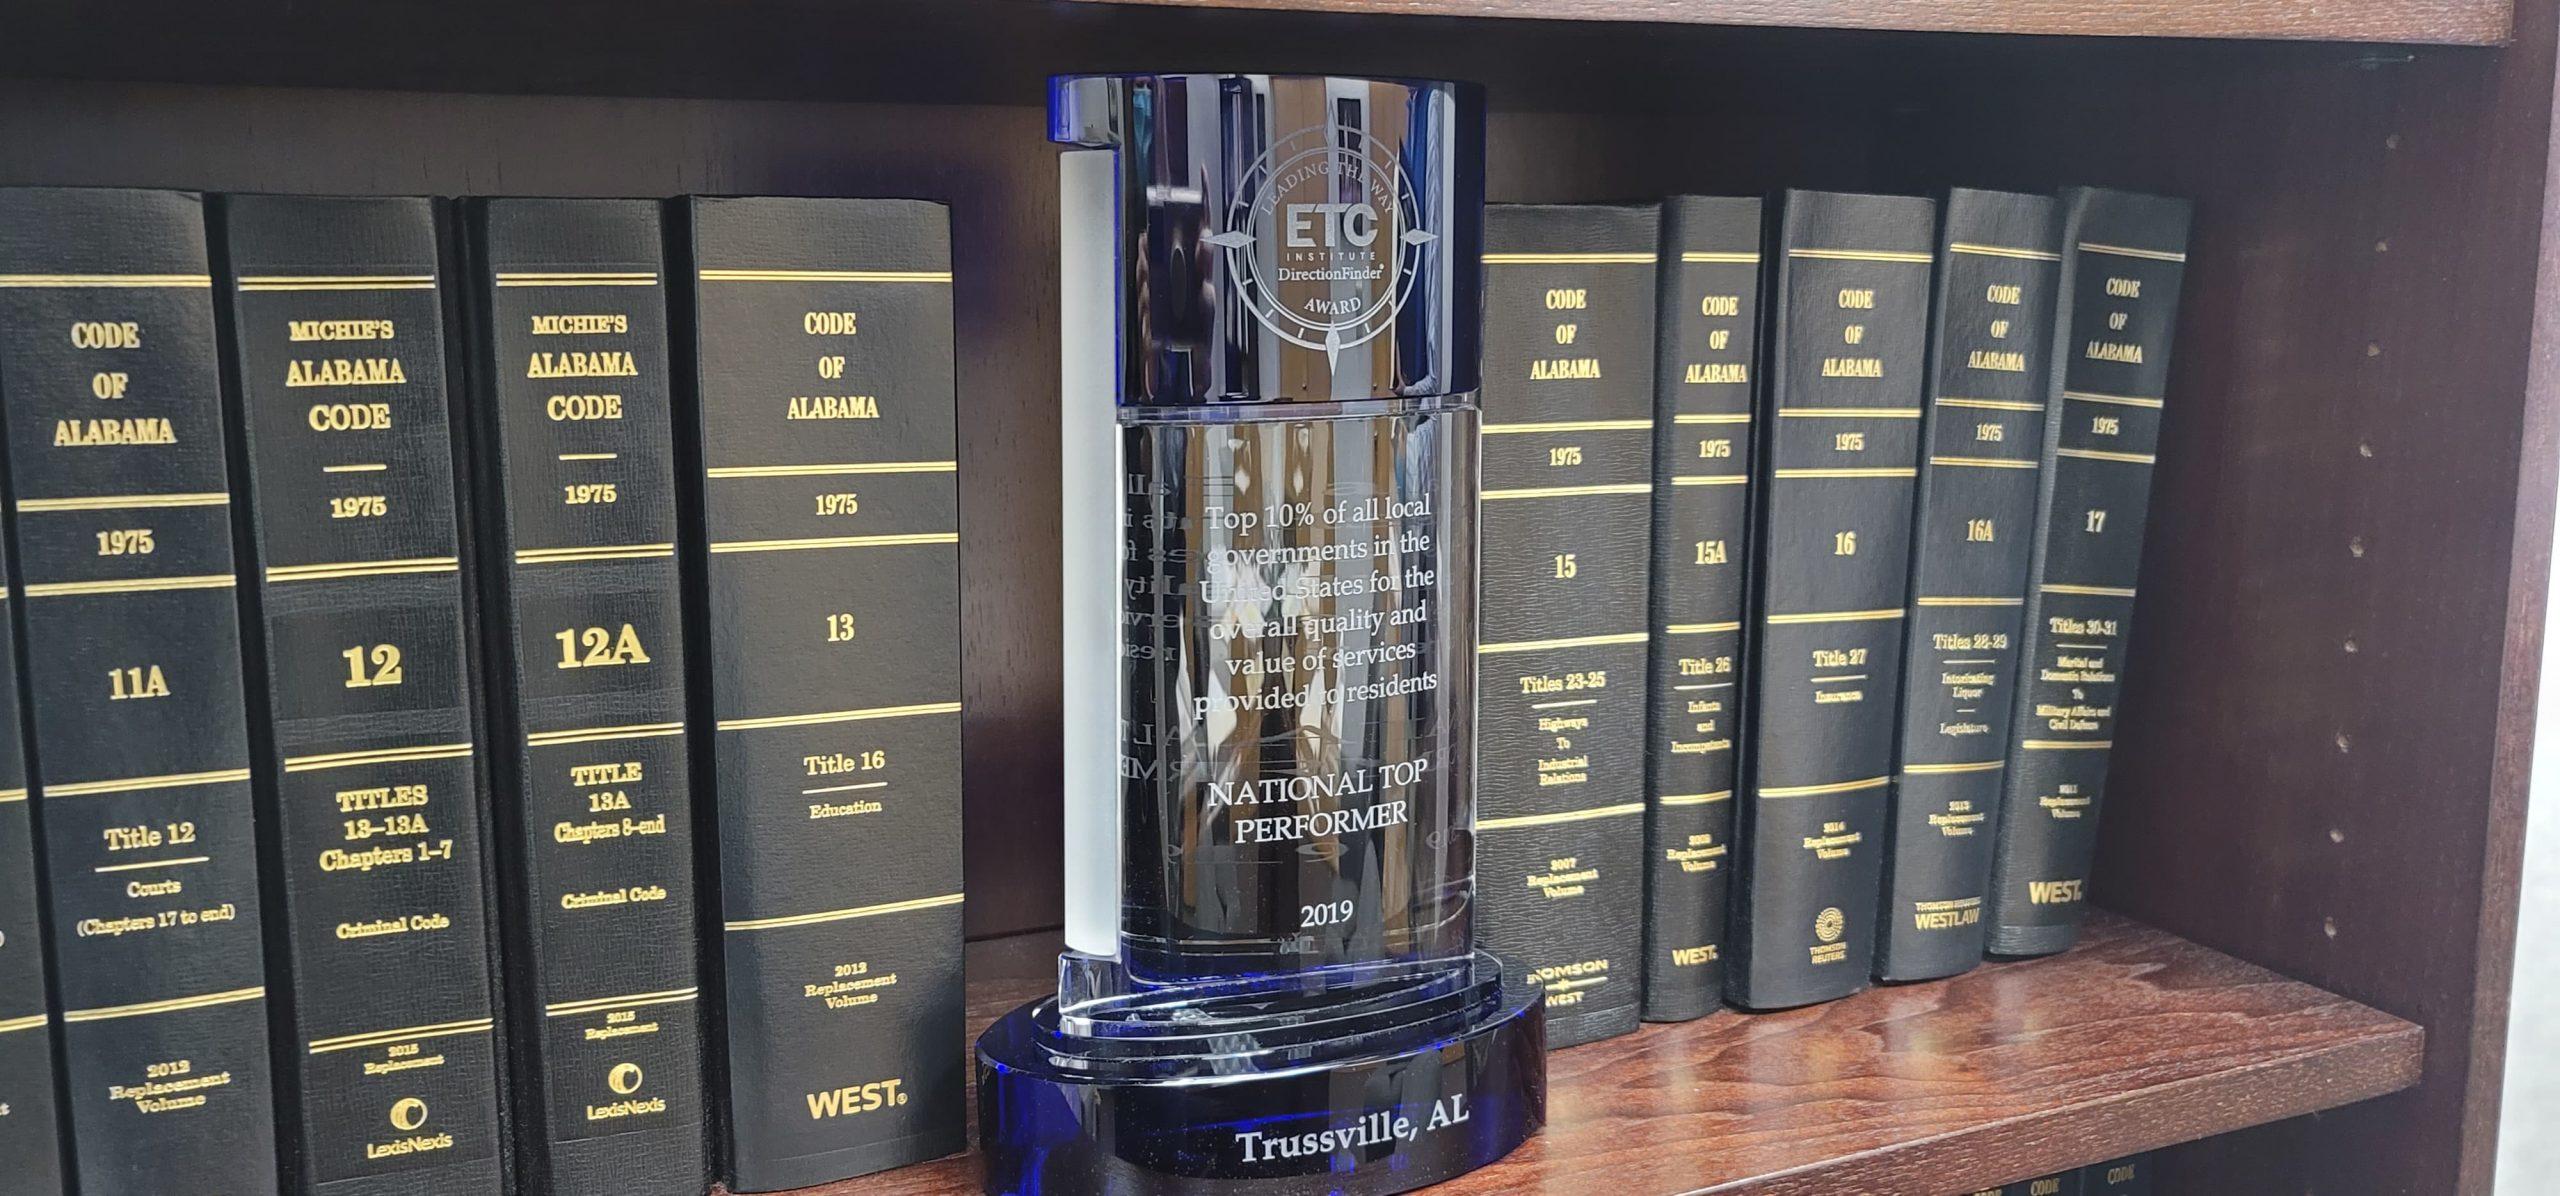 City of Trussville wins national award after citizen survey